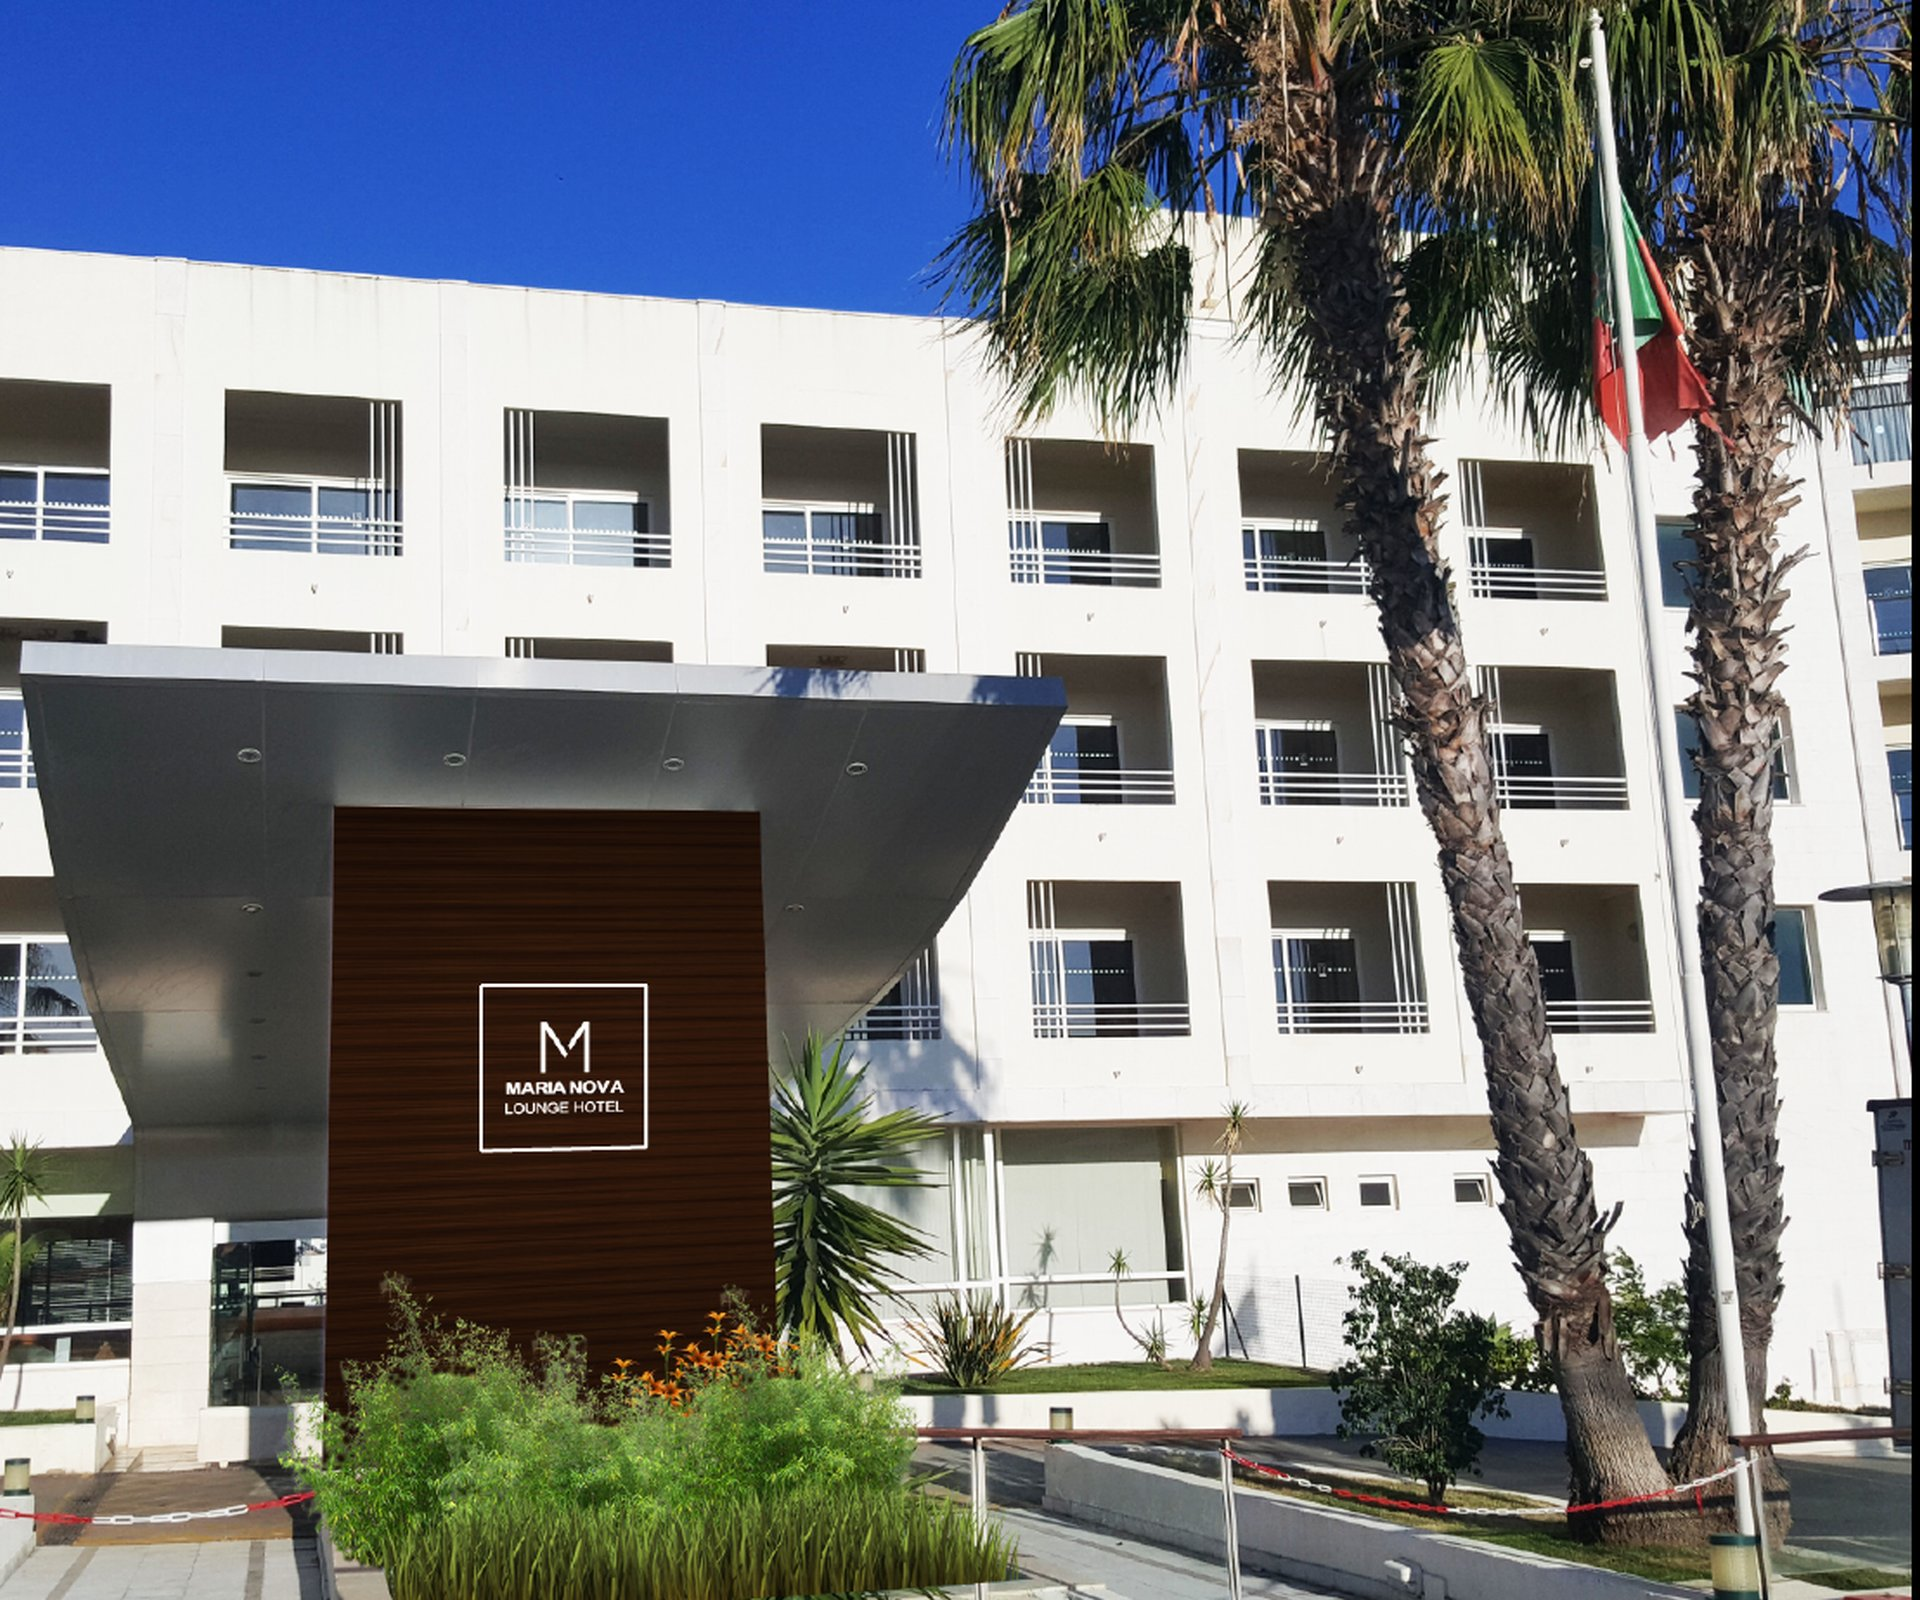 Book Hotels In El Rompido Cartaya For A Good Price Spain